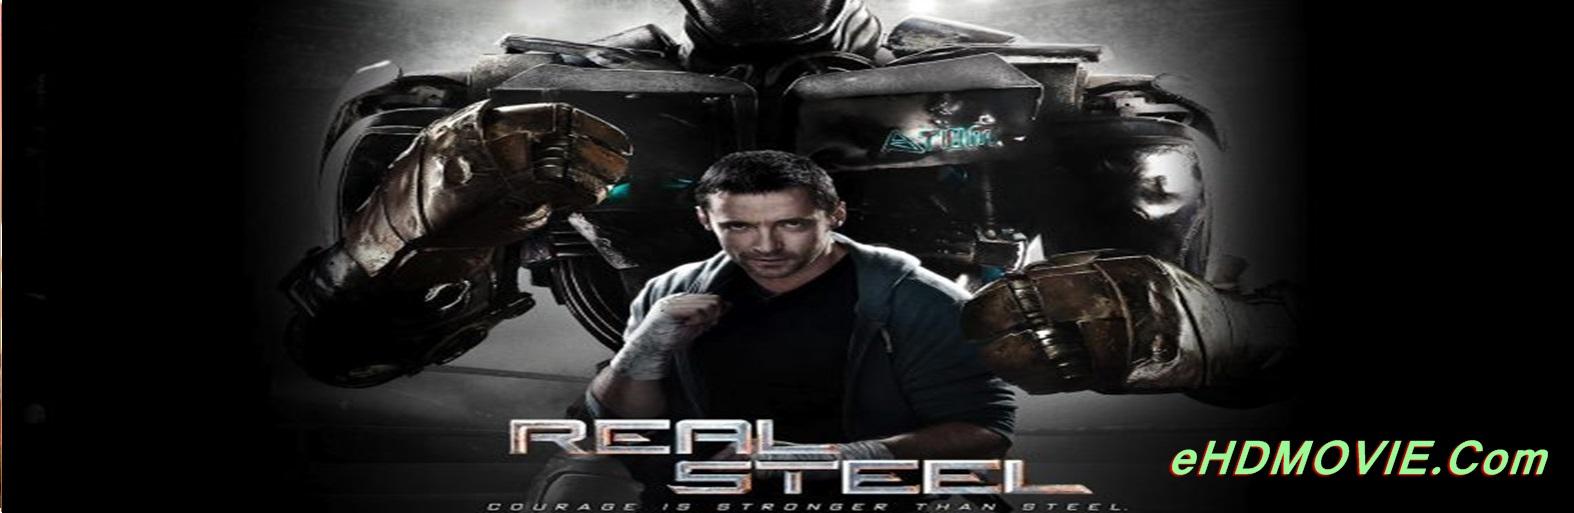 Real Steel 2011 Full Movie Dual Audio [Hindi – English] 720p - 480p ORG BRRip 450MB - 1GB ESubs Free Download